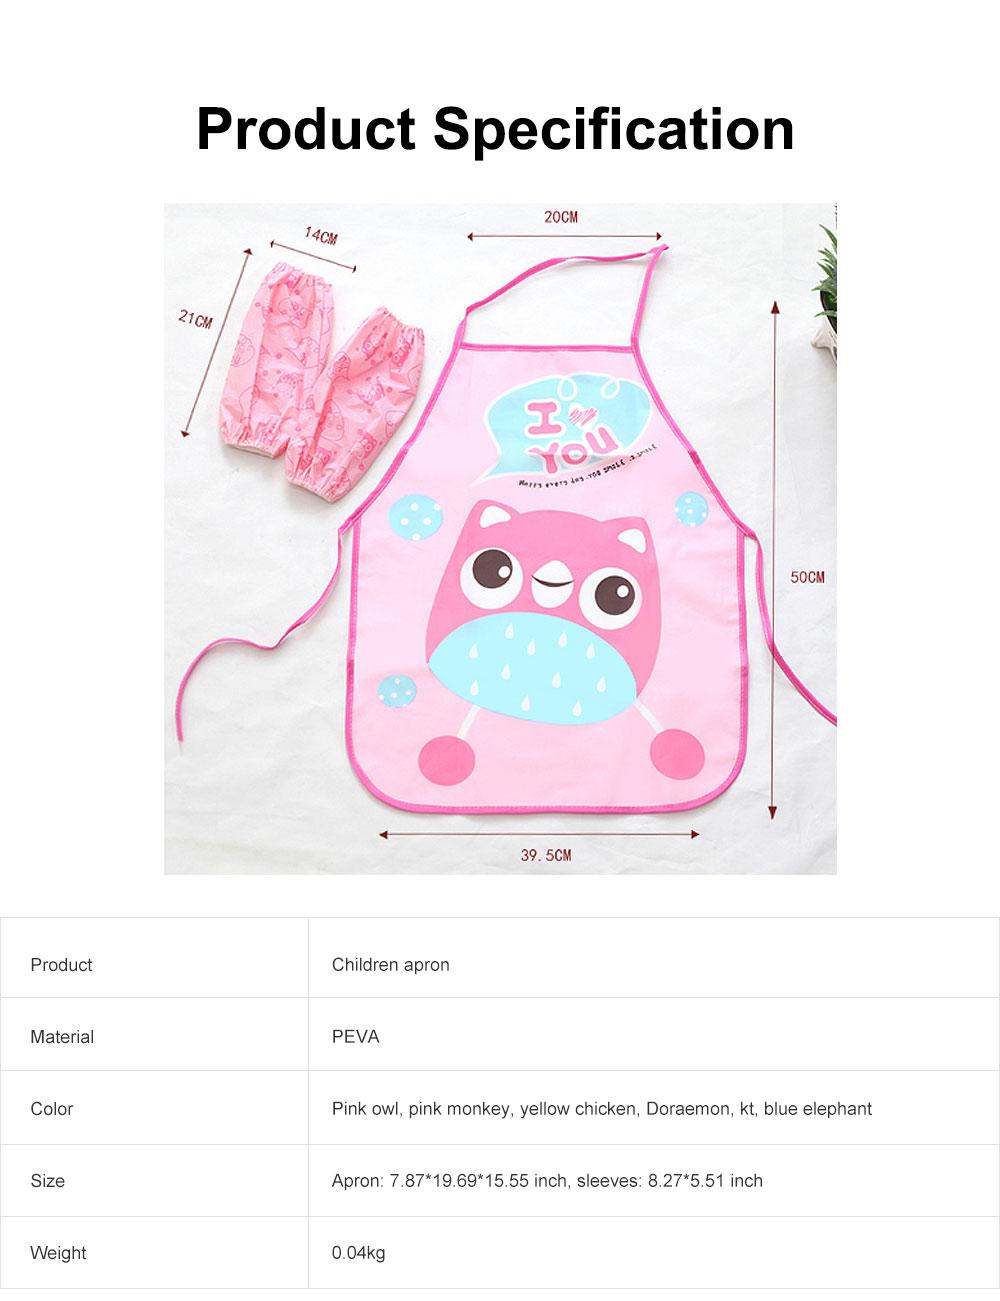 Children Cartoon Apron, PEVA Creative Lovely Pattern Cute Apron, Waterproof Painting Anti-fouling Sleeveless Bust Apron 6